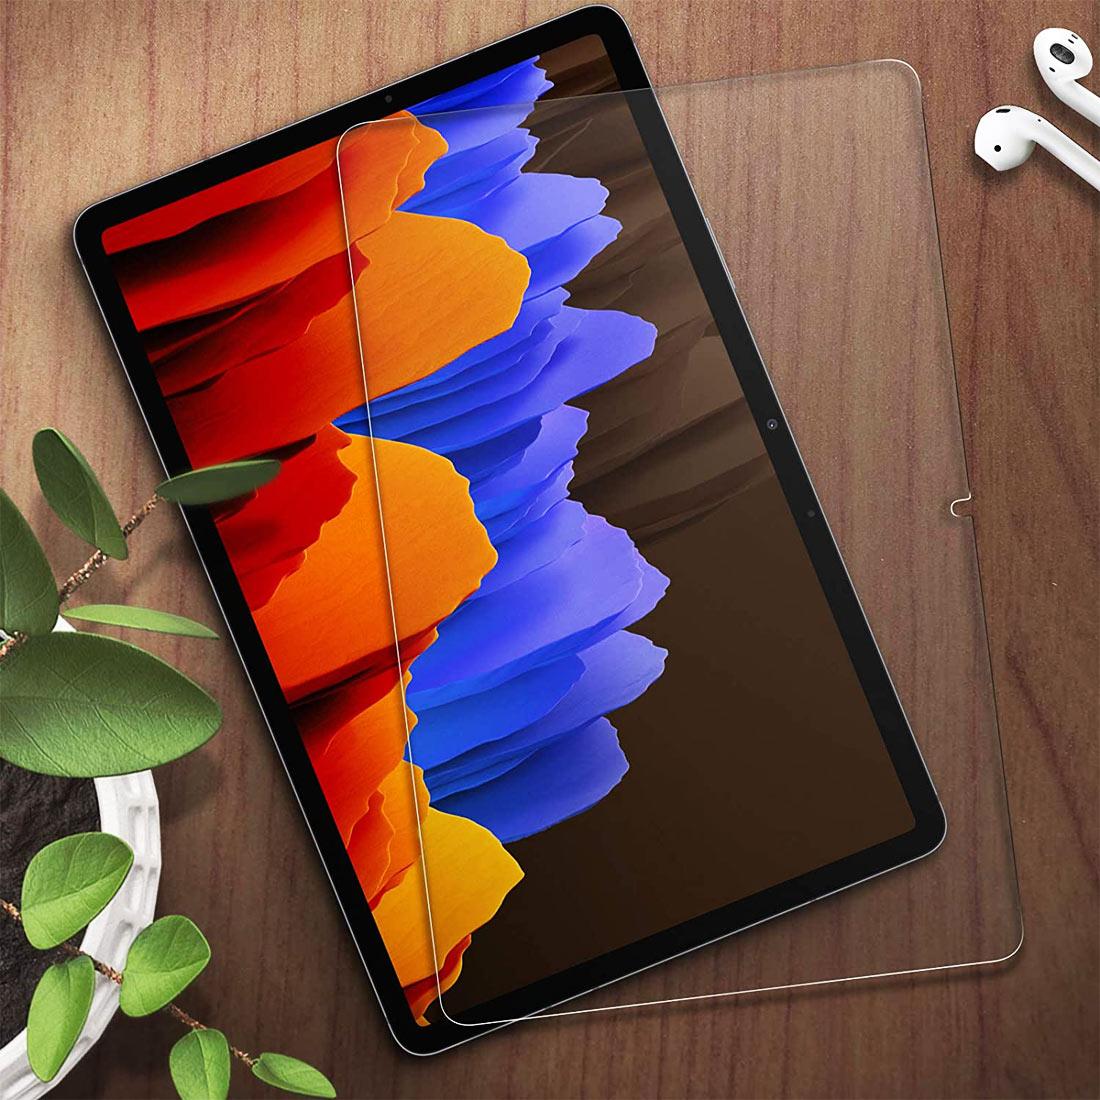 Стекло для Samsung Galaxy Tab S7 Plus 12.4 SM-T970 / SM-T975 / SM-T976 закаленное